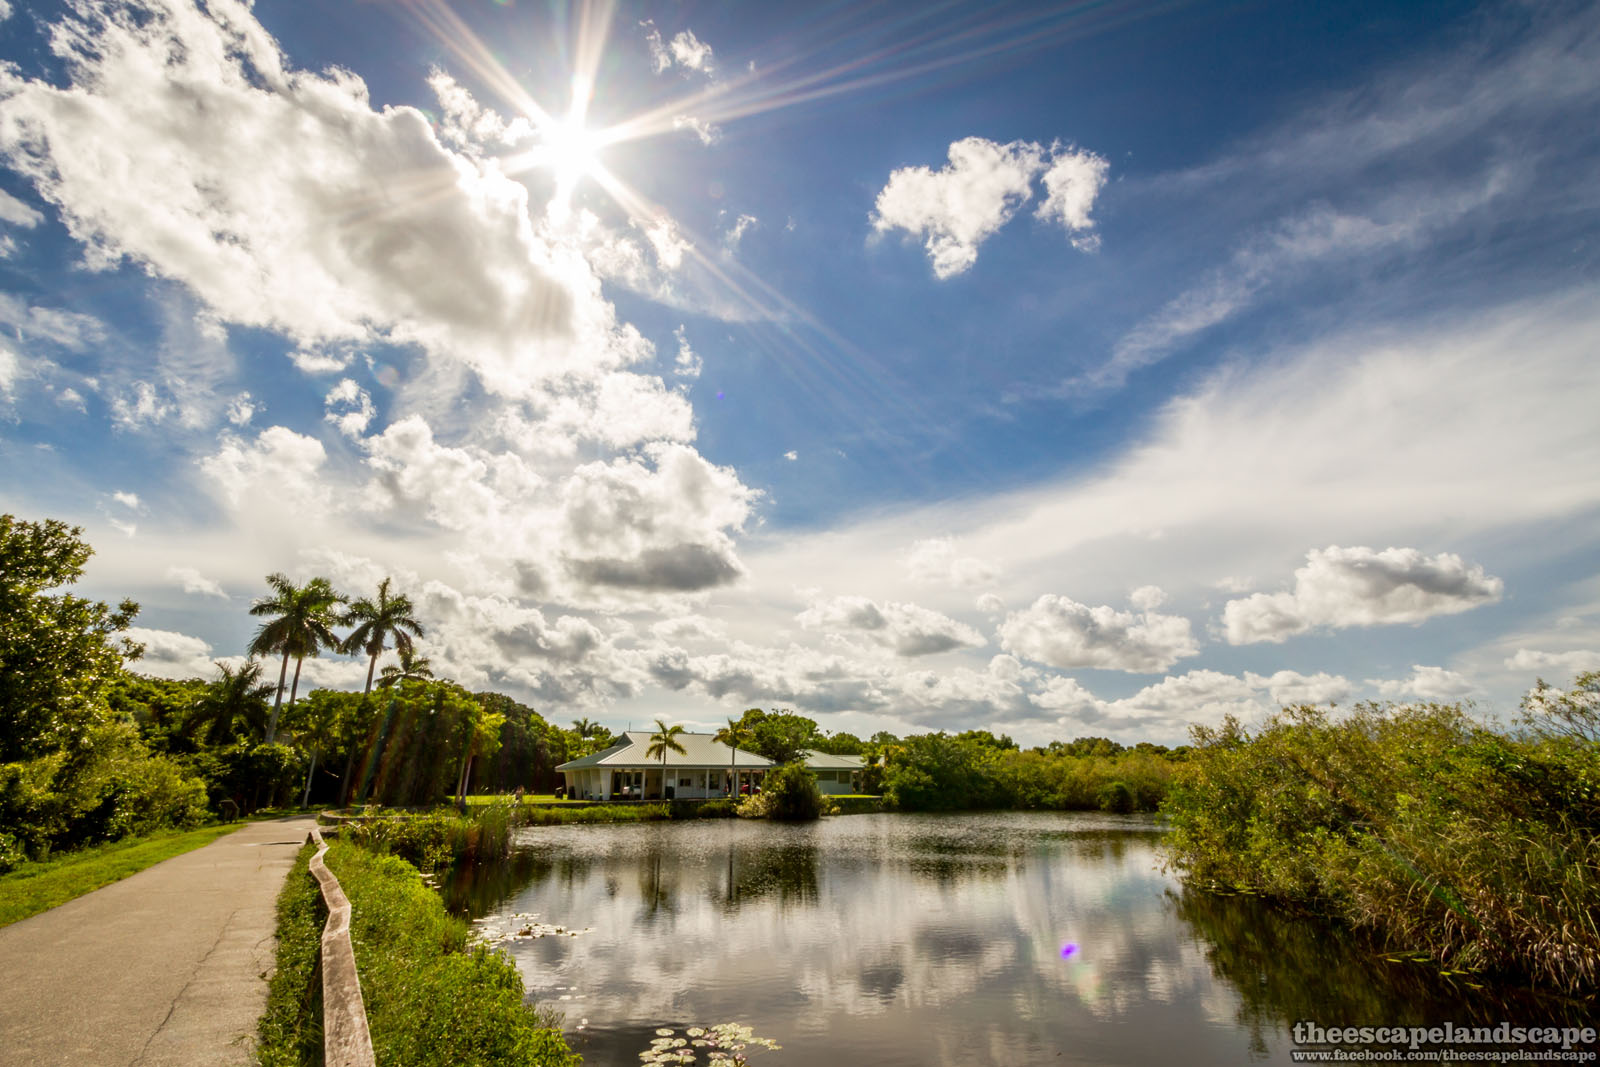 everglades_nemzeti_park_florida_04